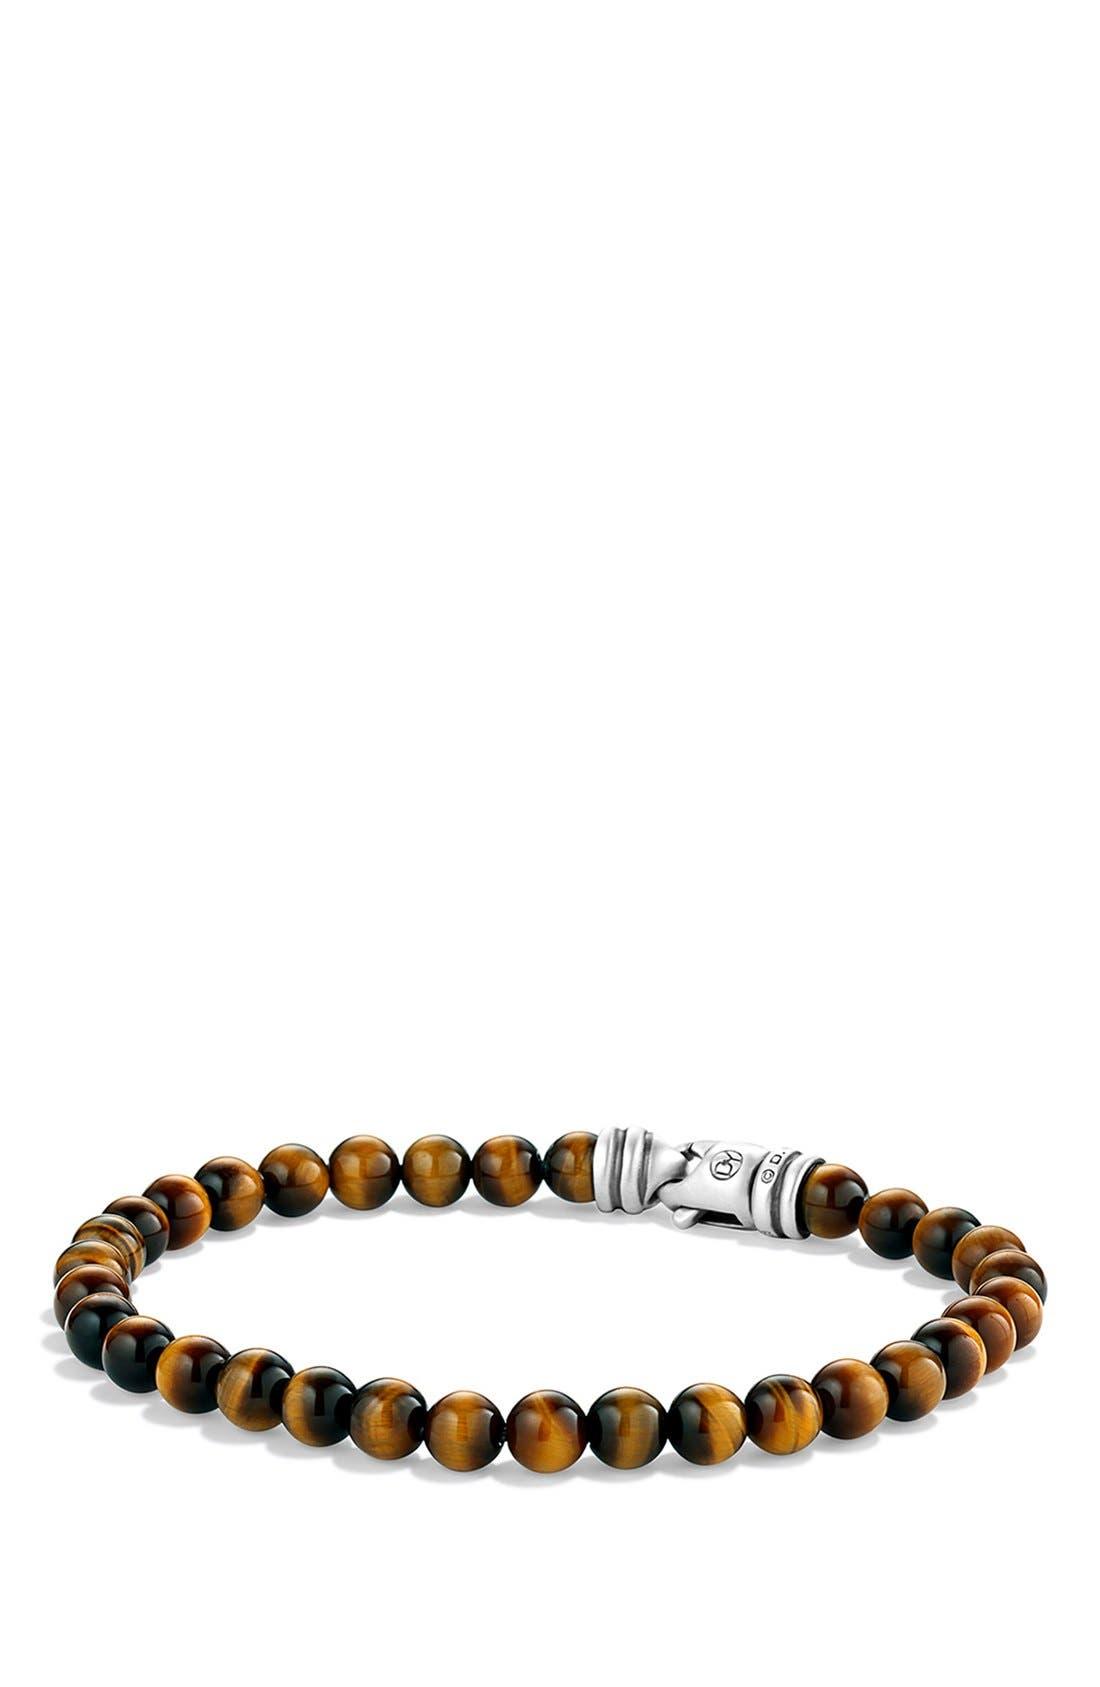 david yurman beadsu0027 bracelet